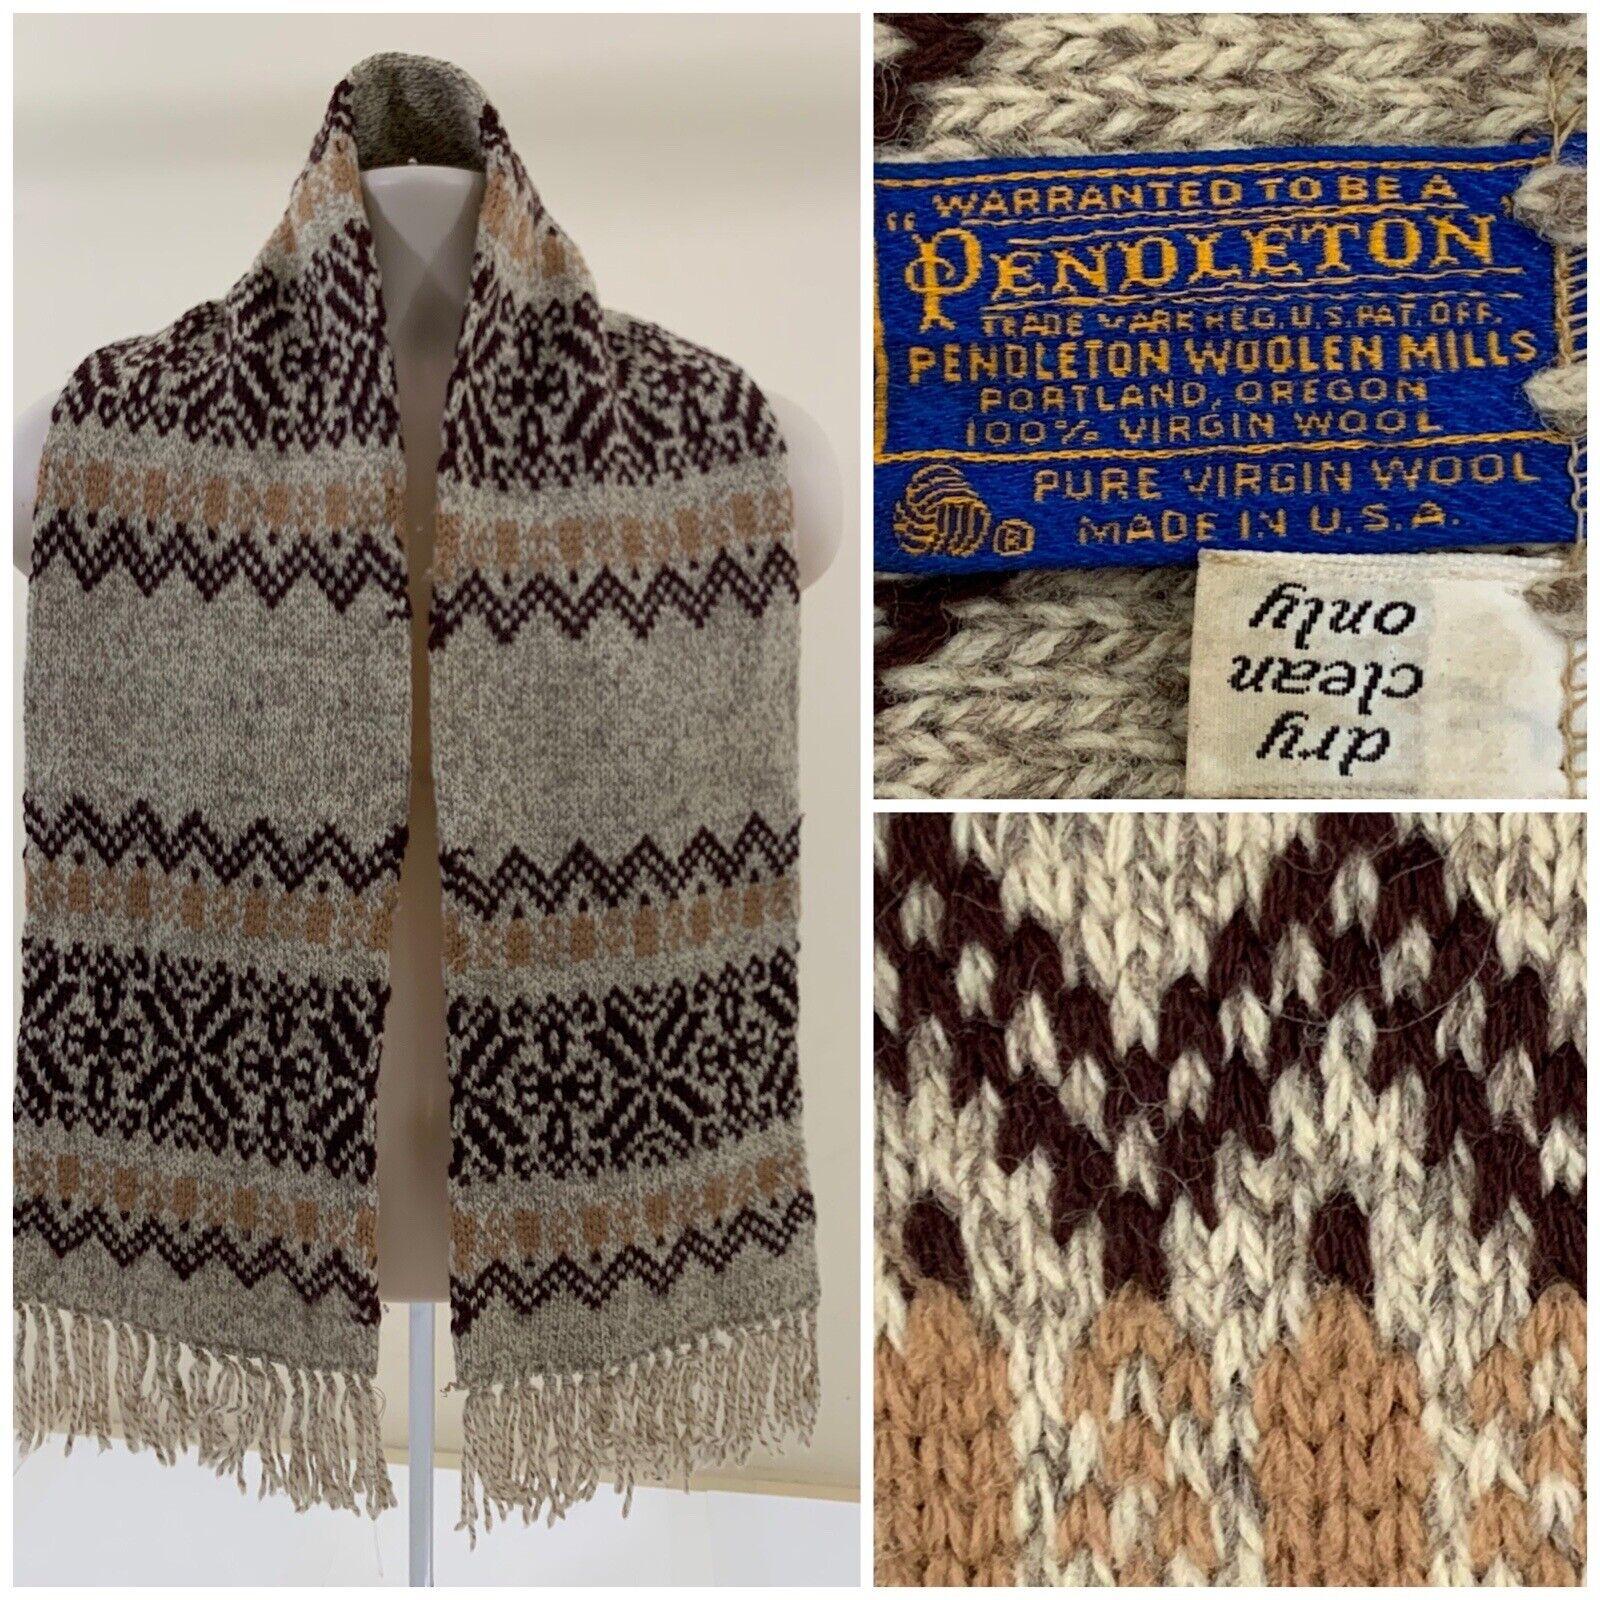 Vintage Pendleton Unisex Virgin Wool Heavy Duty Scarf Multicolor Made in USA